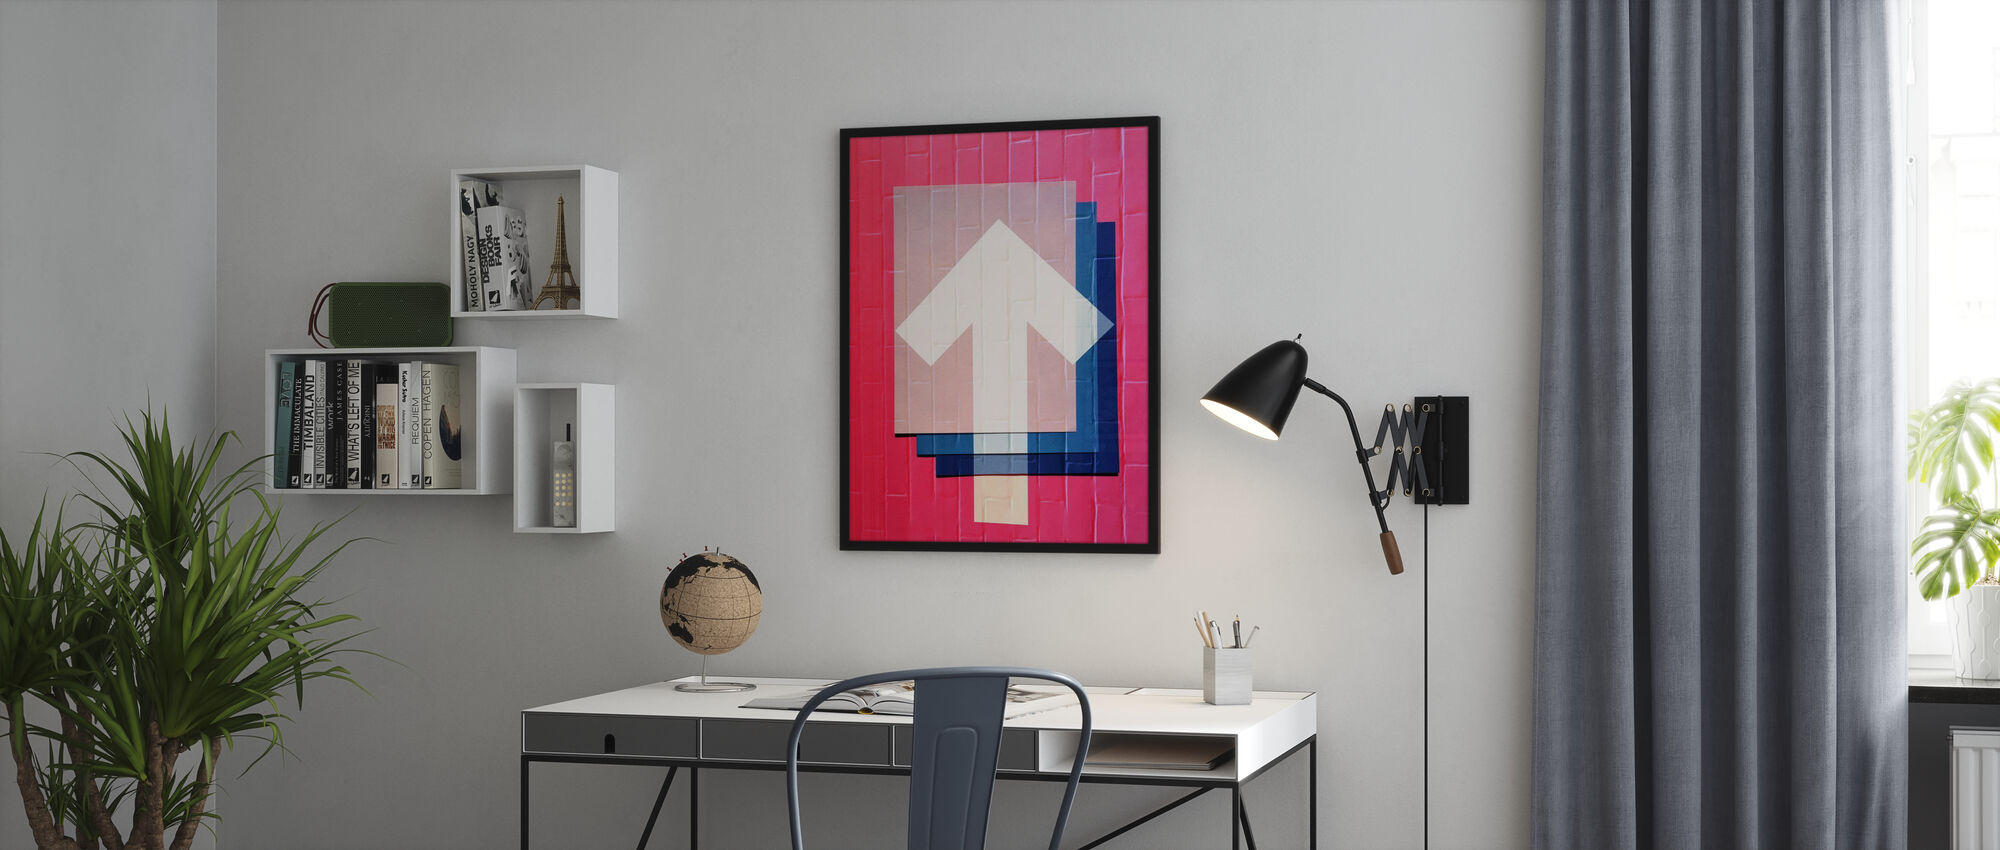 Pink Graffiti - Poster - Office